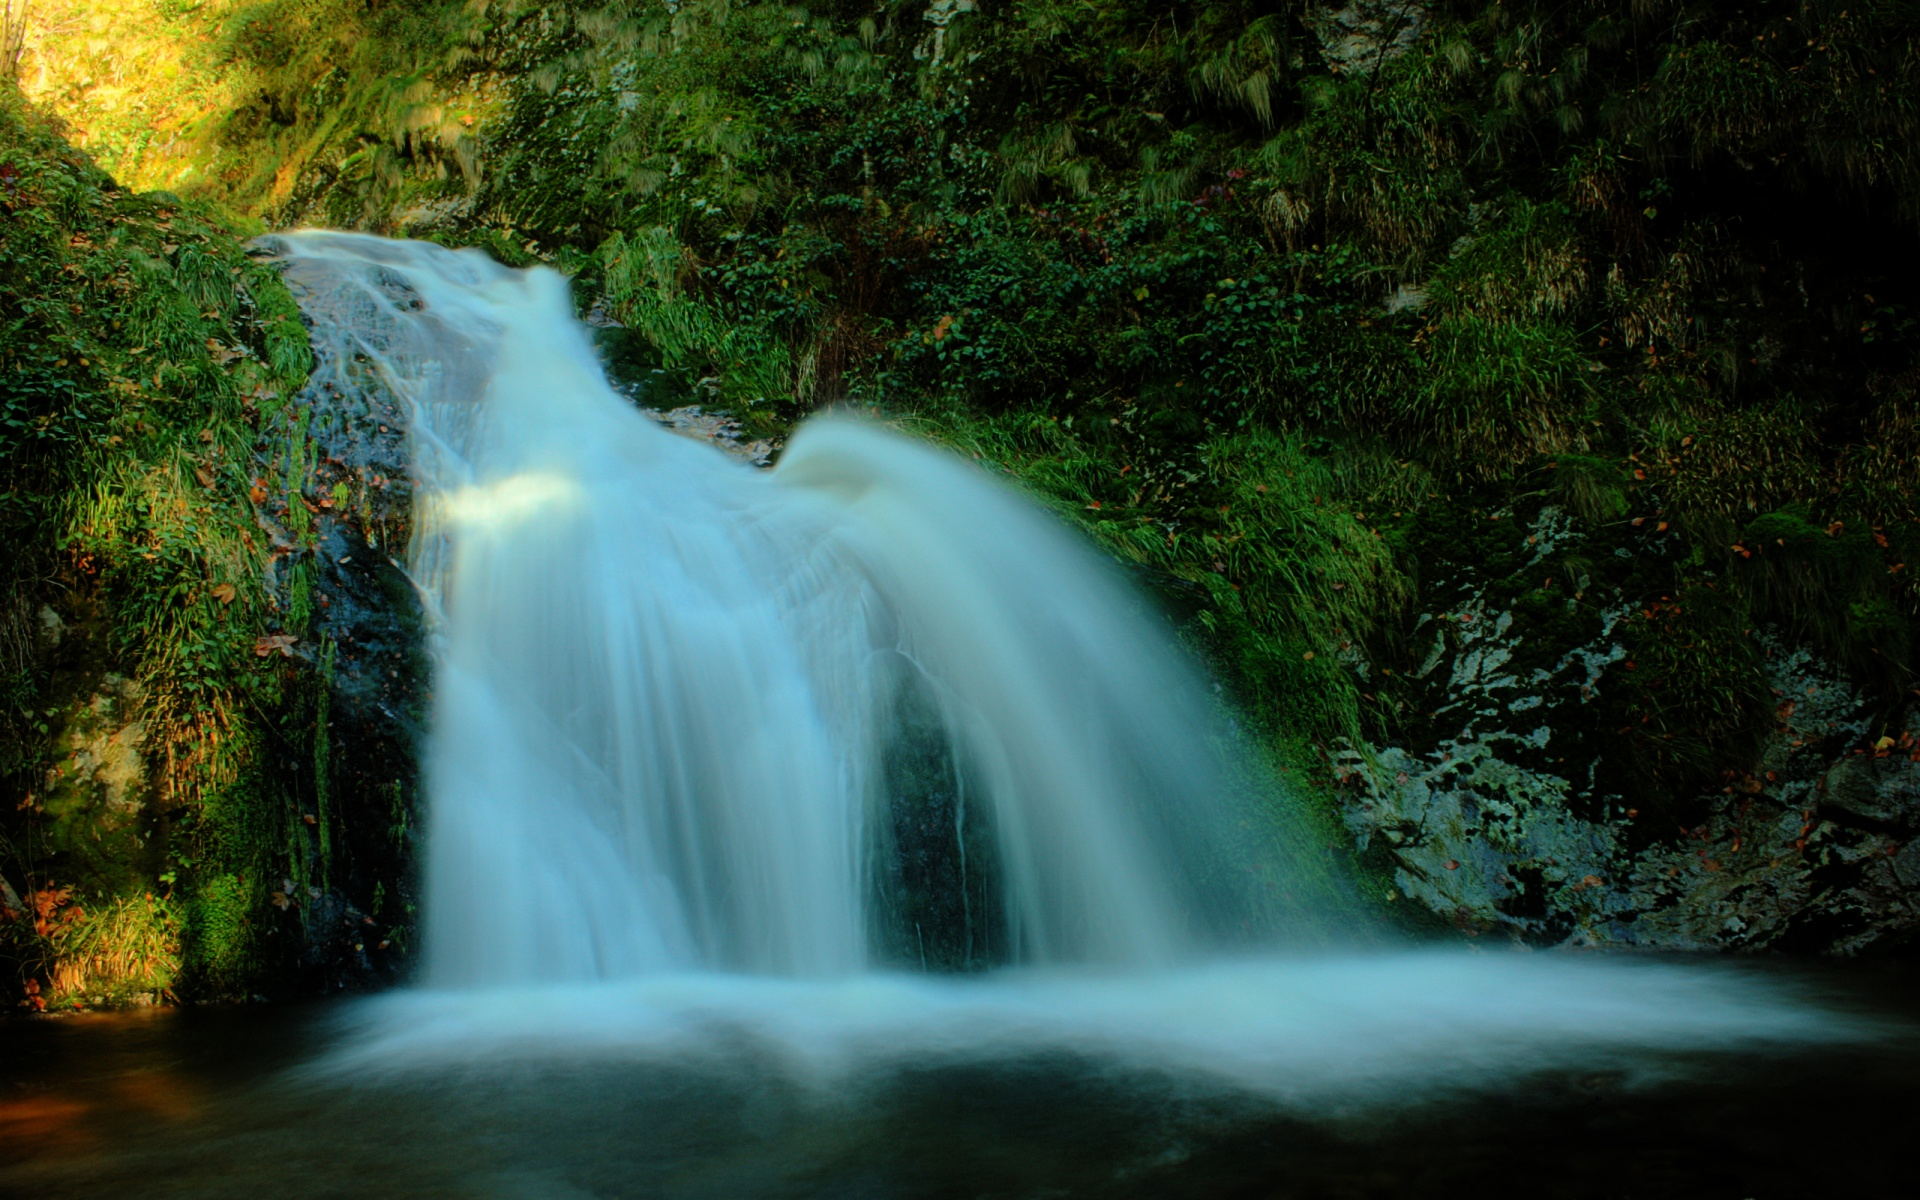 05 11 2017 1680x1050 Waterfall Desktop Wallpapers Free Nature